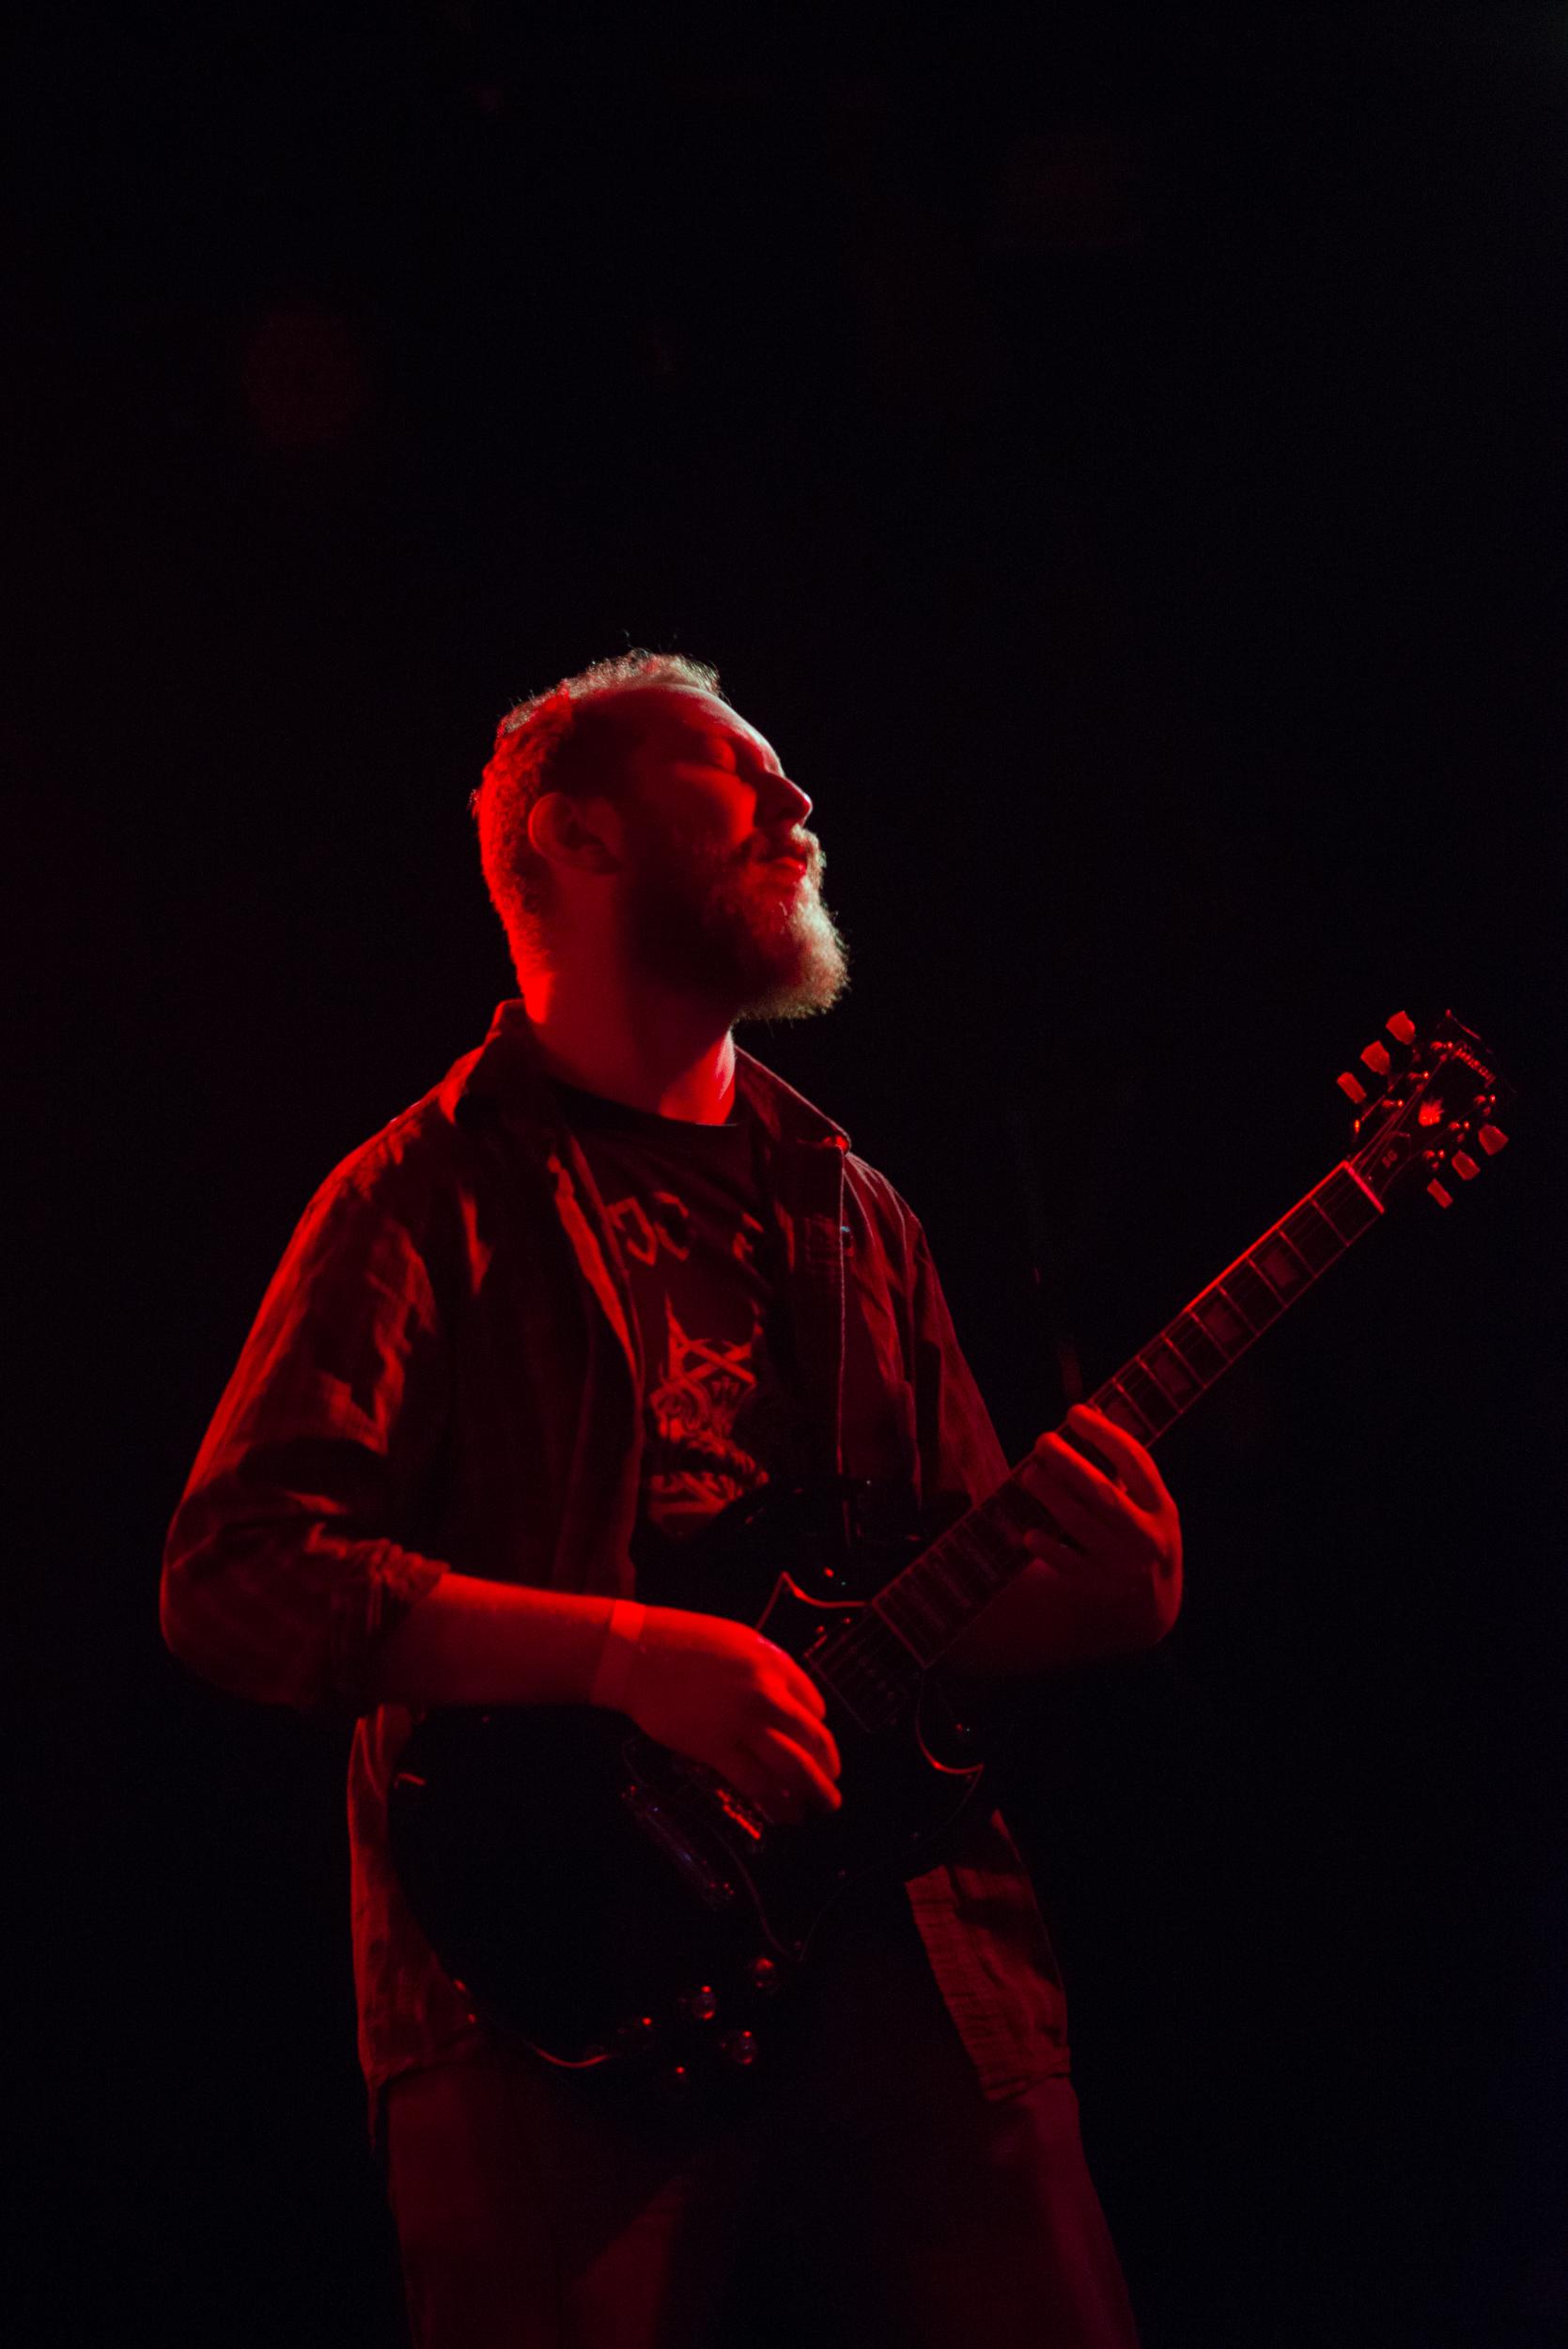 hail-eris-guitar-band-editorial-photography-brooklyn-ny-the-knitting-factory.jpg